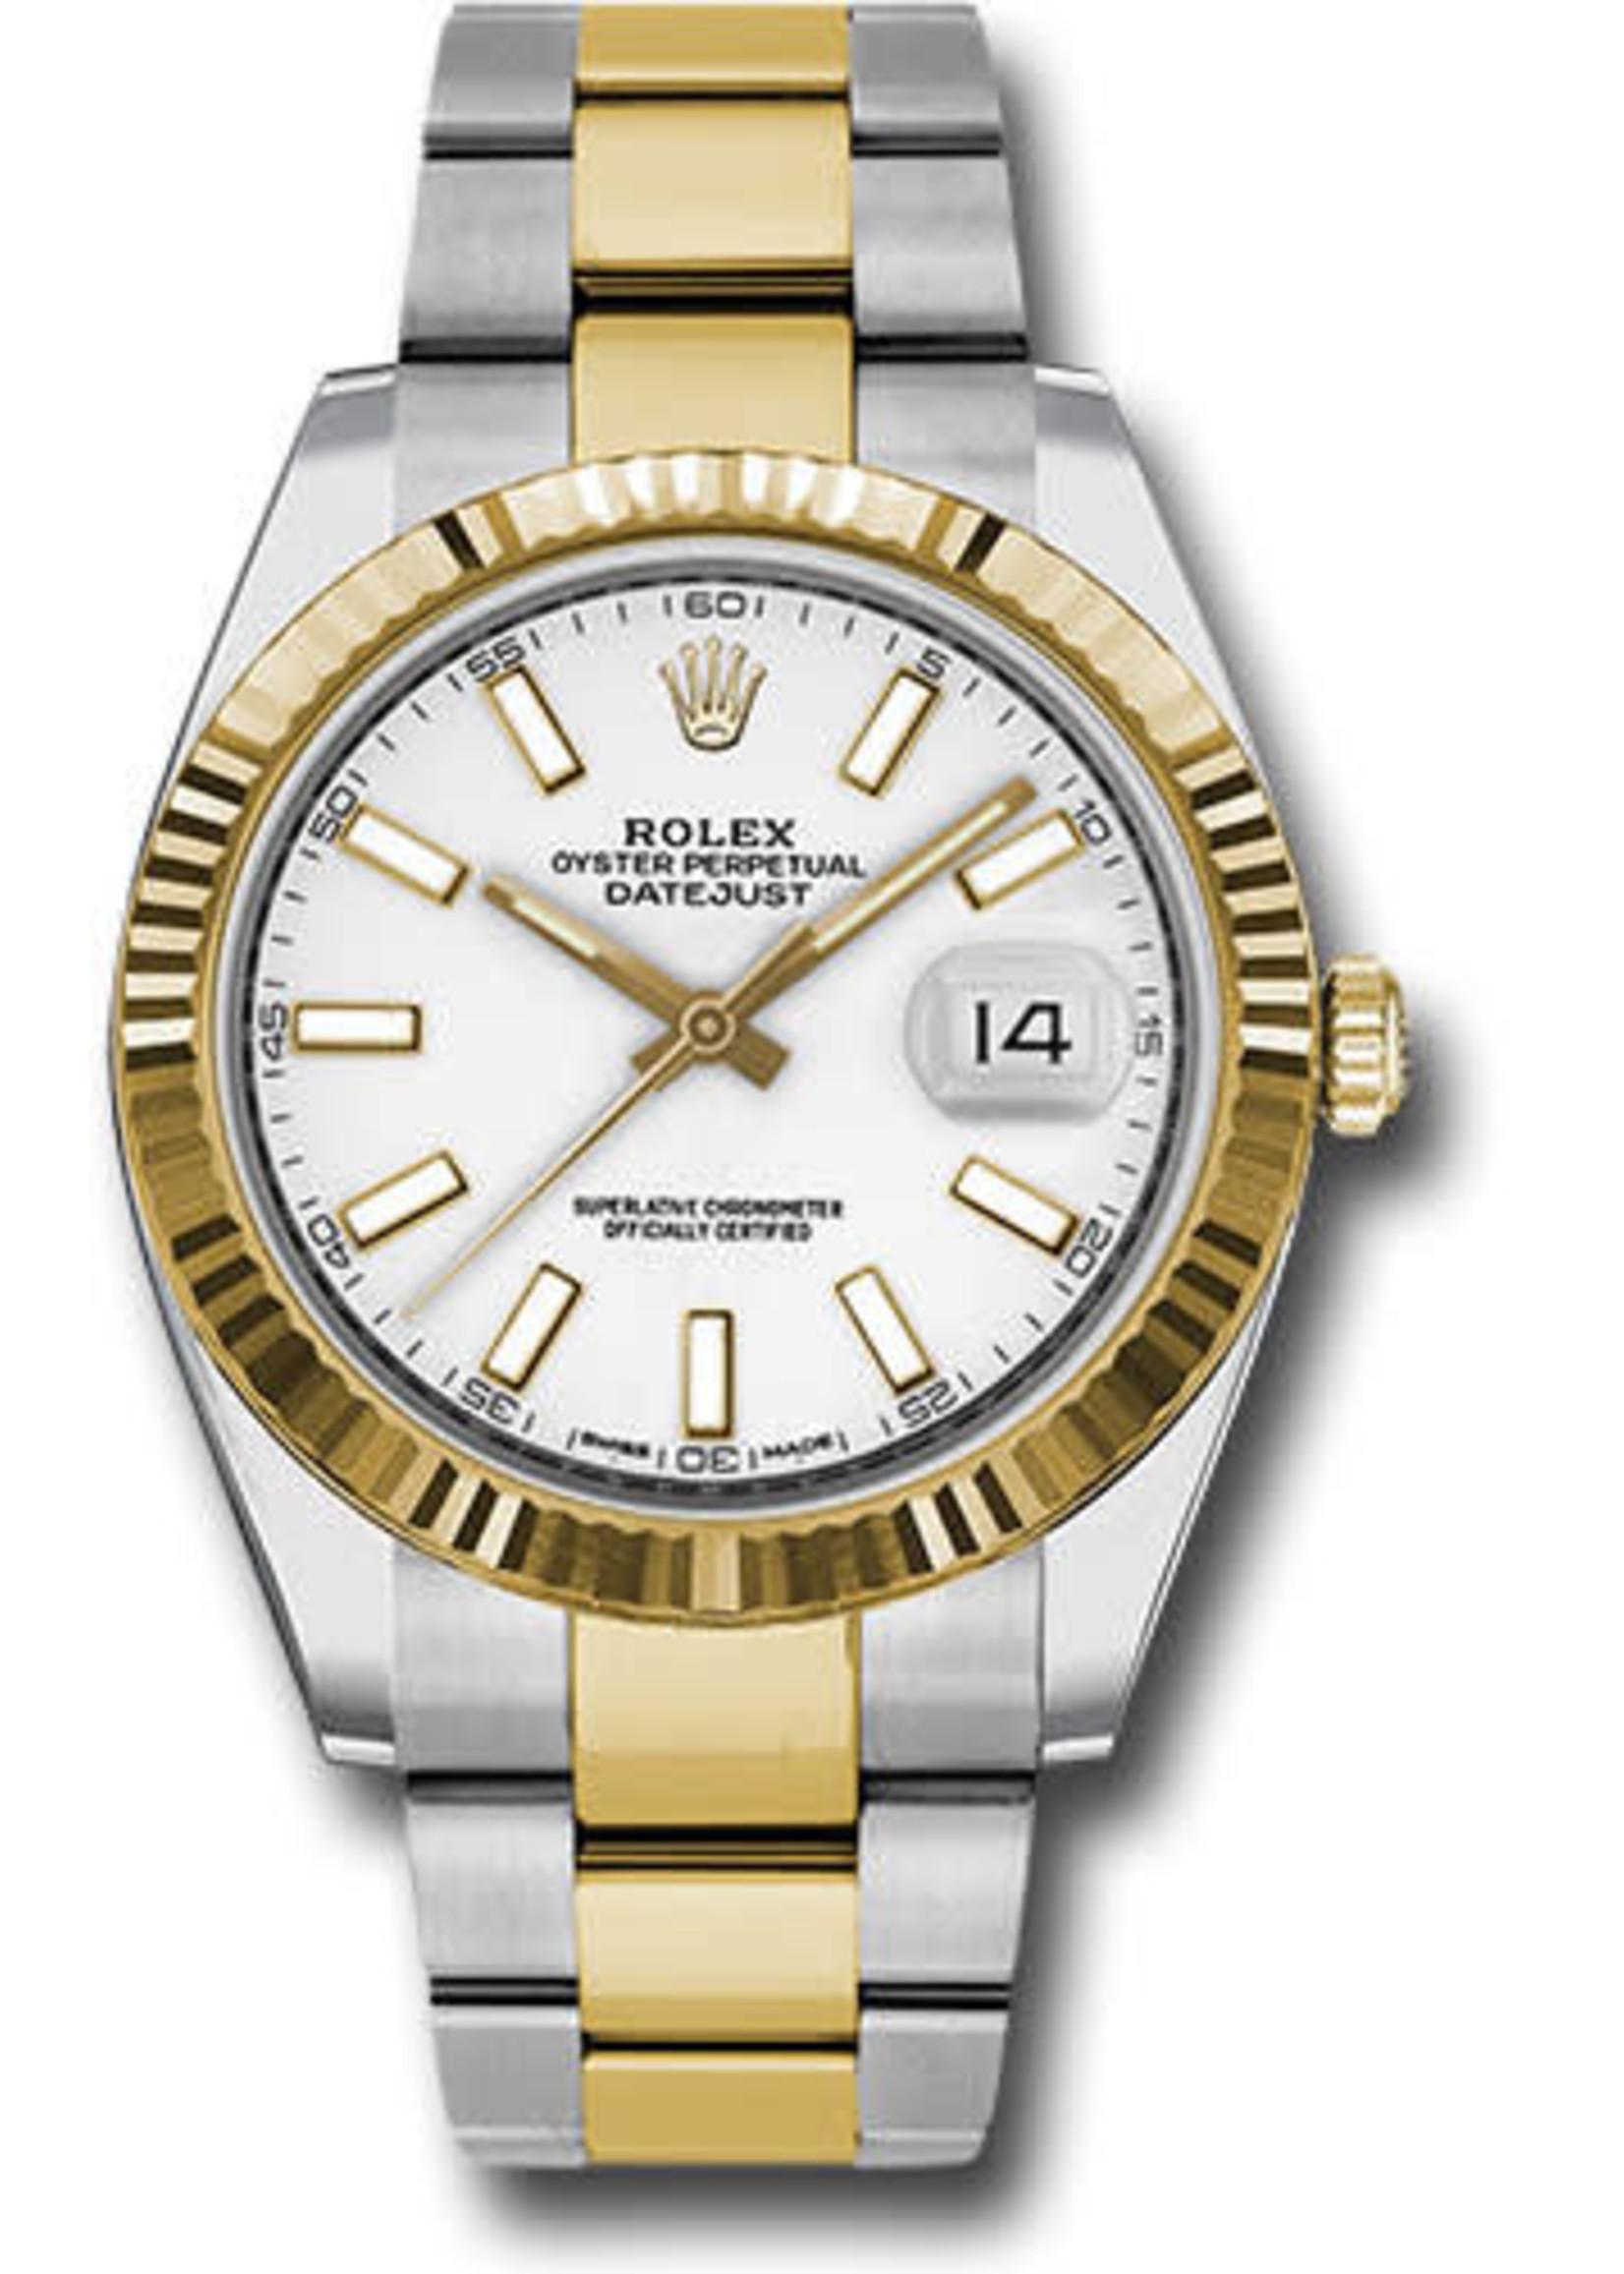 Rolex ROLEX DATEJUST II 41MM STEEL & YELLOW GOLD #126333